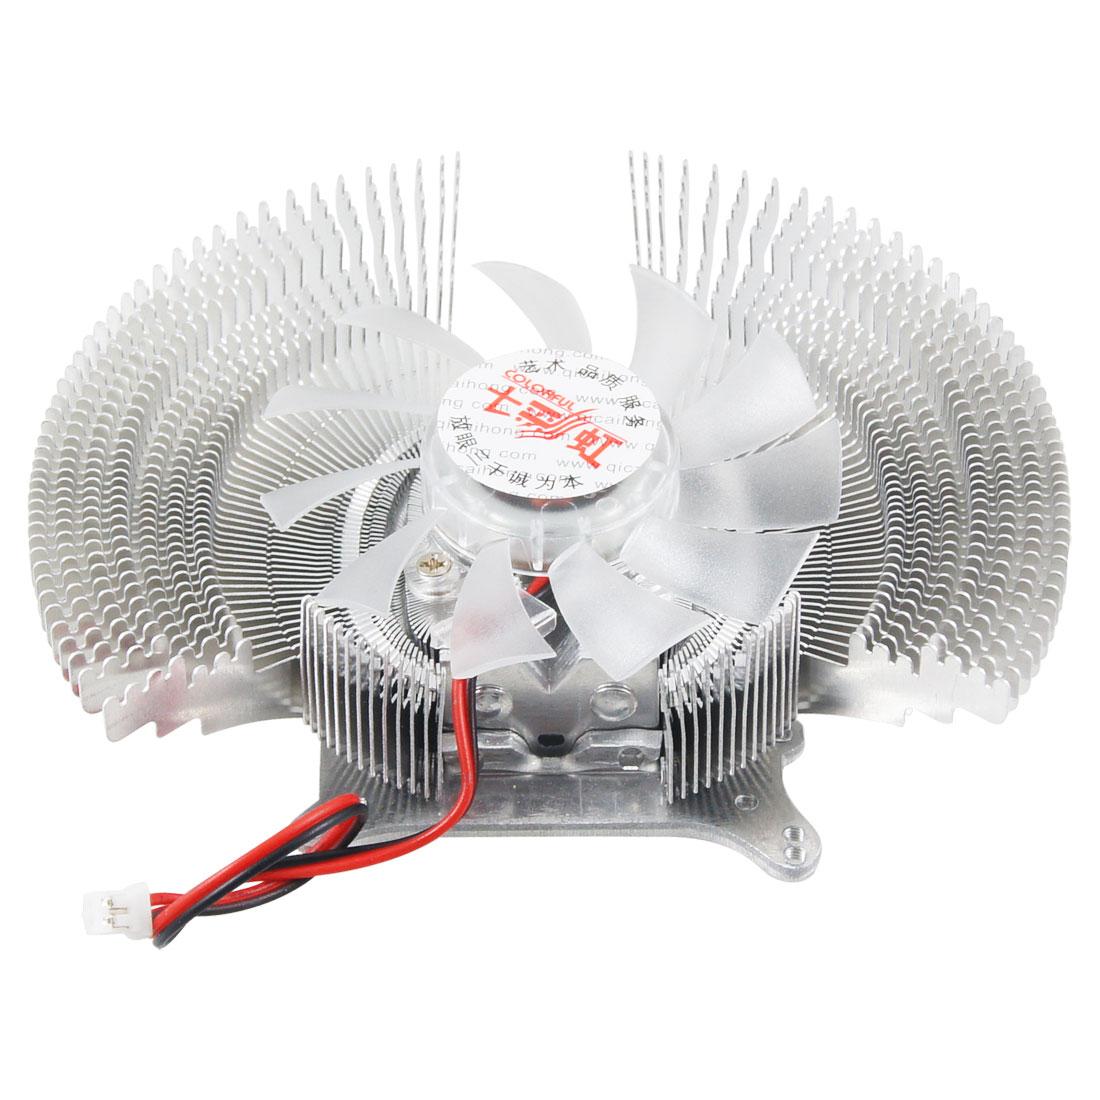 DC 12V 0.18A 2800RPM 2 Terminals Computer CPU Heatsink Cooling Fan Cooler